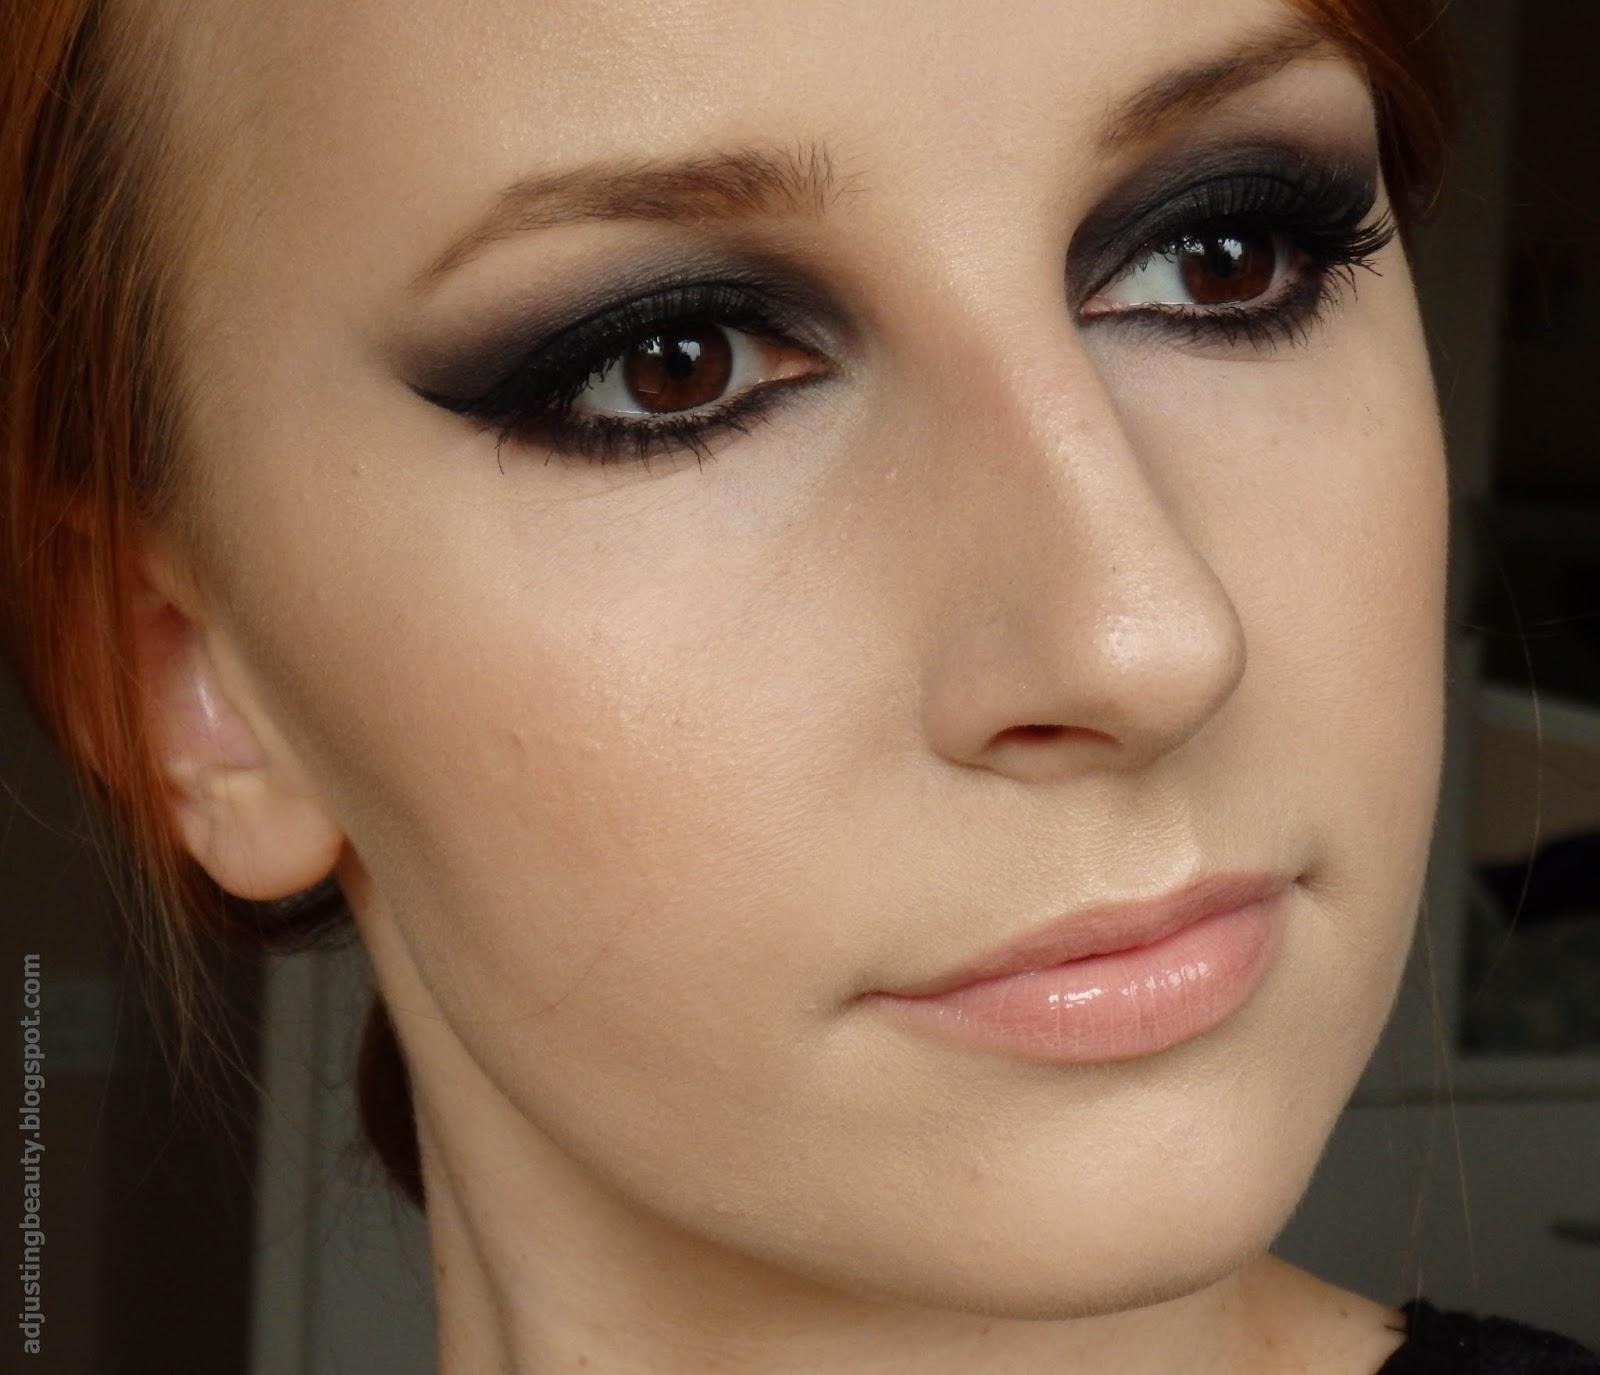 Taylor Swift Bad Blood inspired makeup - winged smoky eye ...